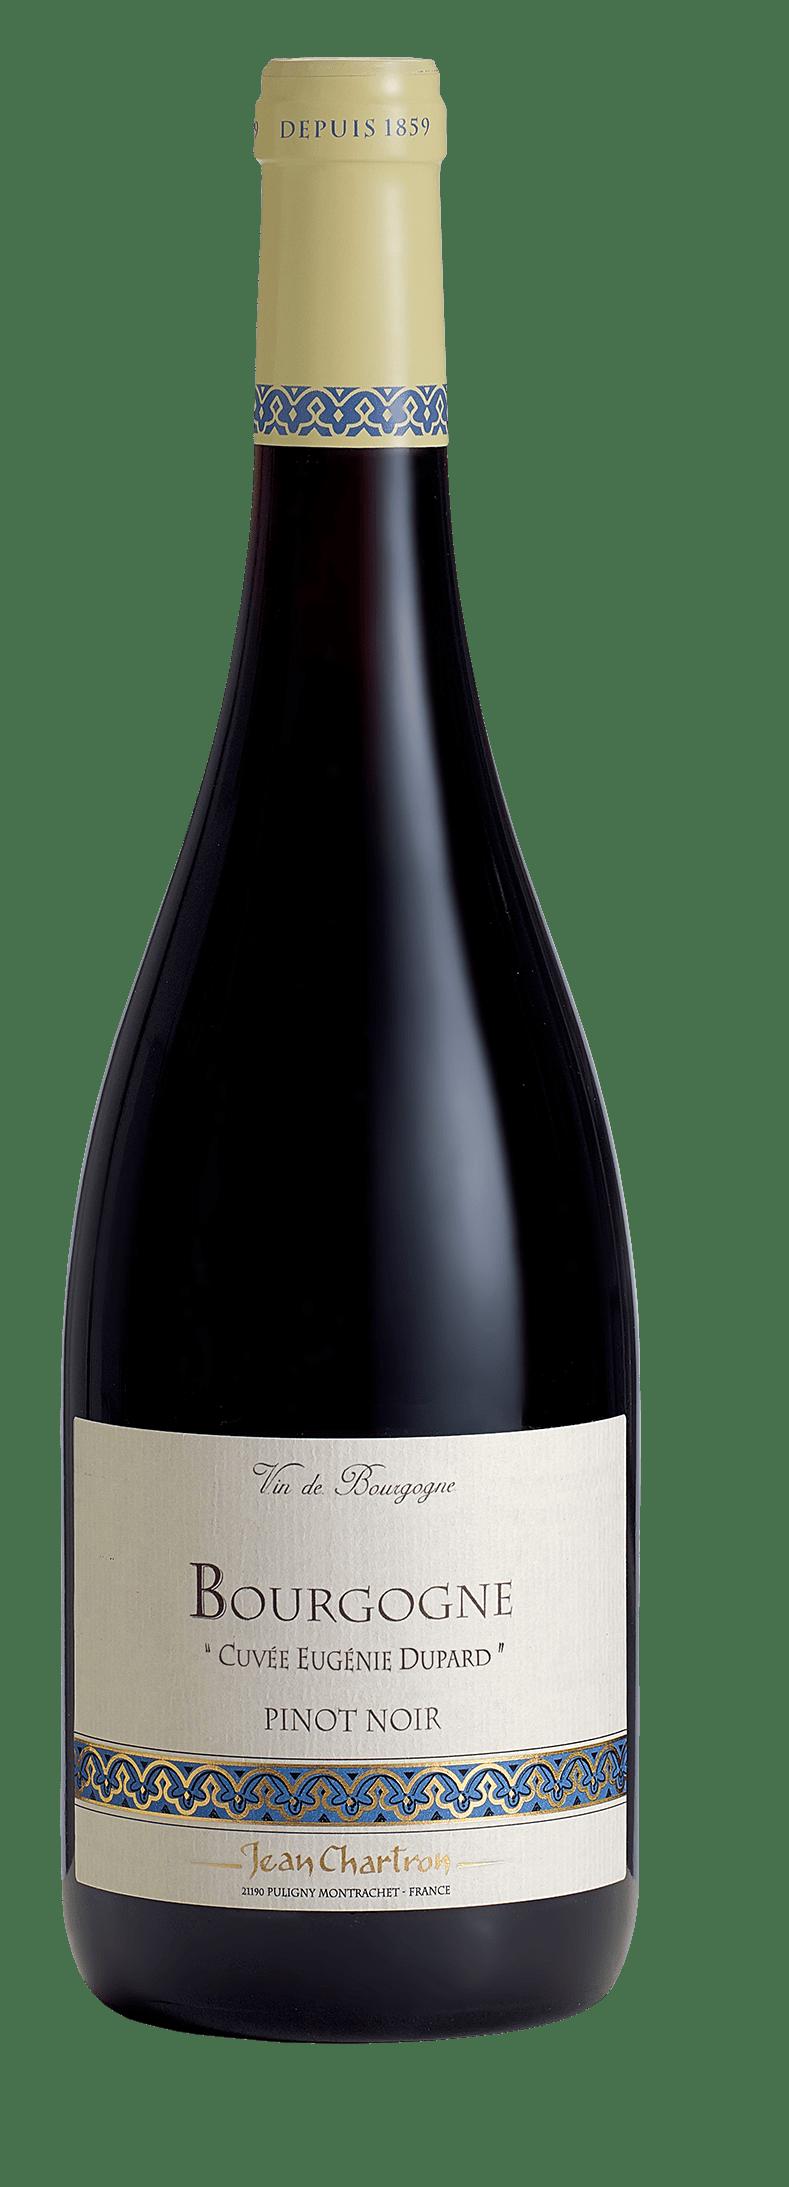 Bourgogne Cuvée Eugénie Dupard